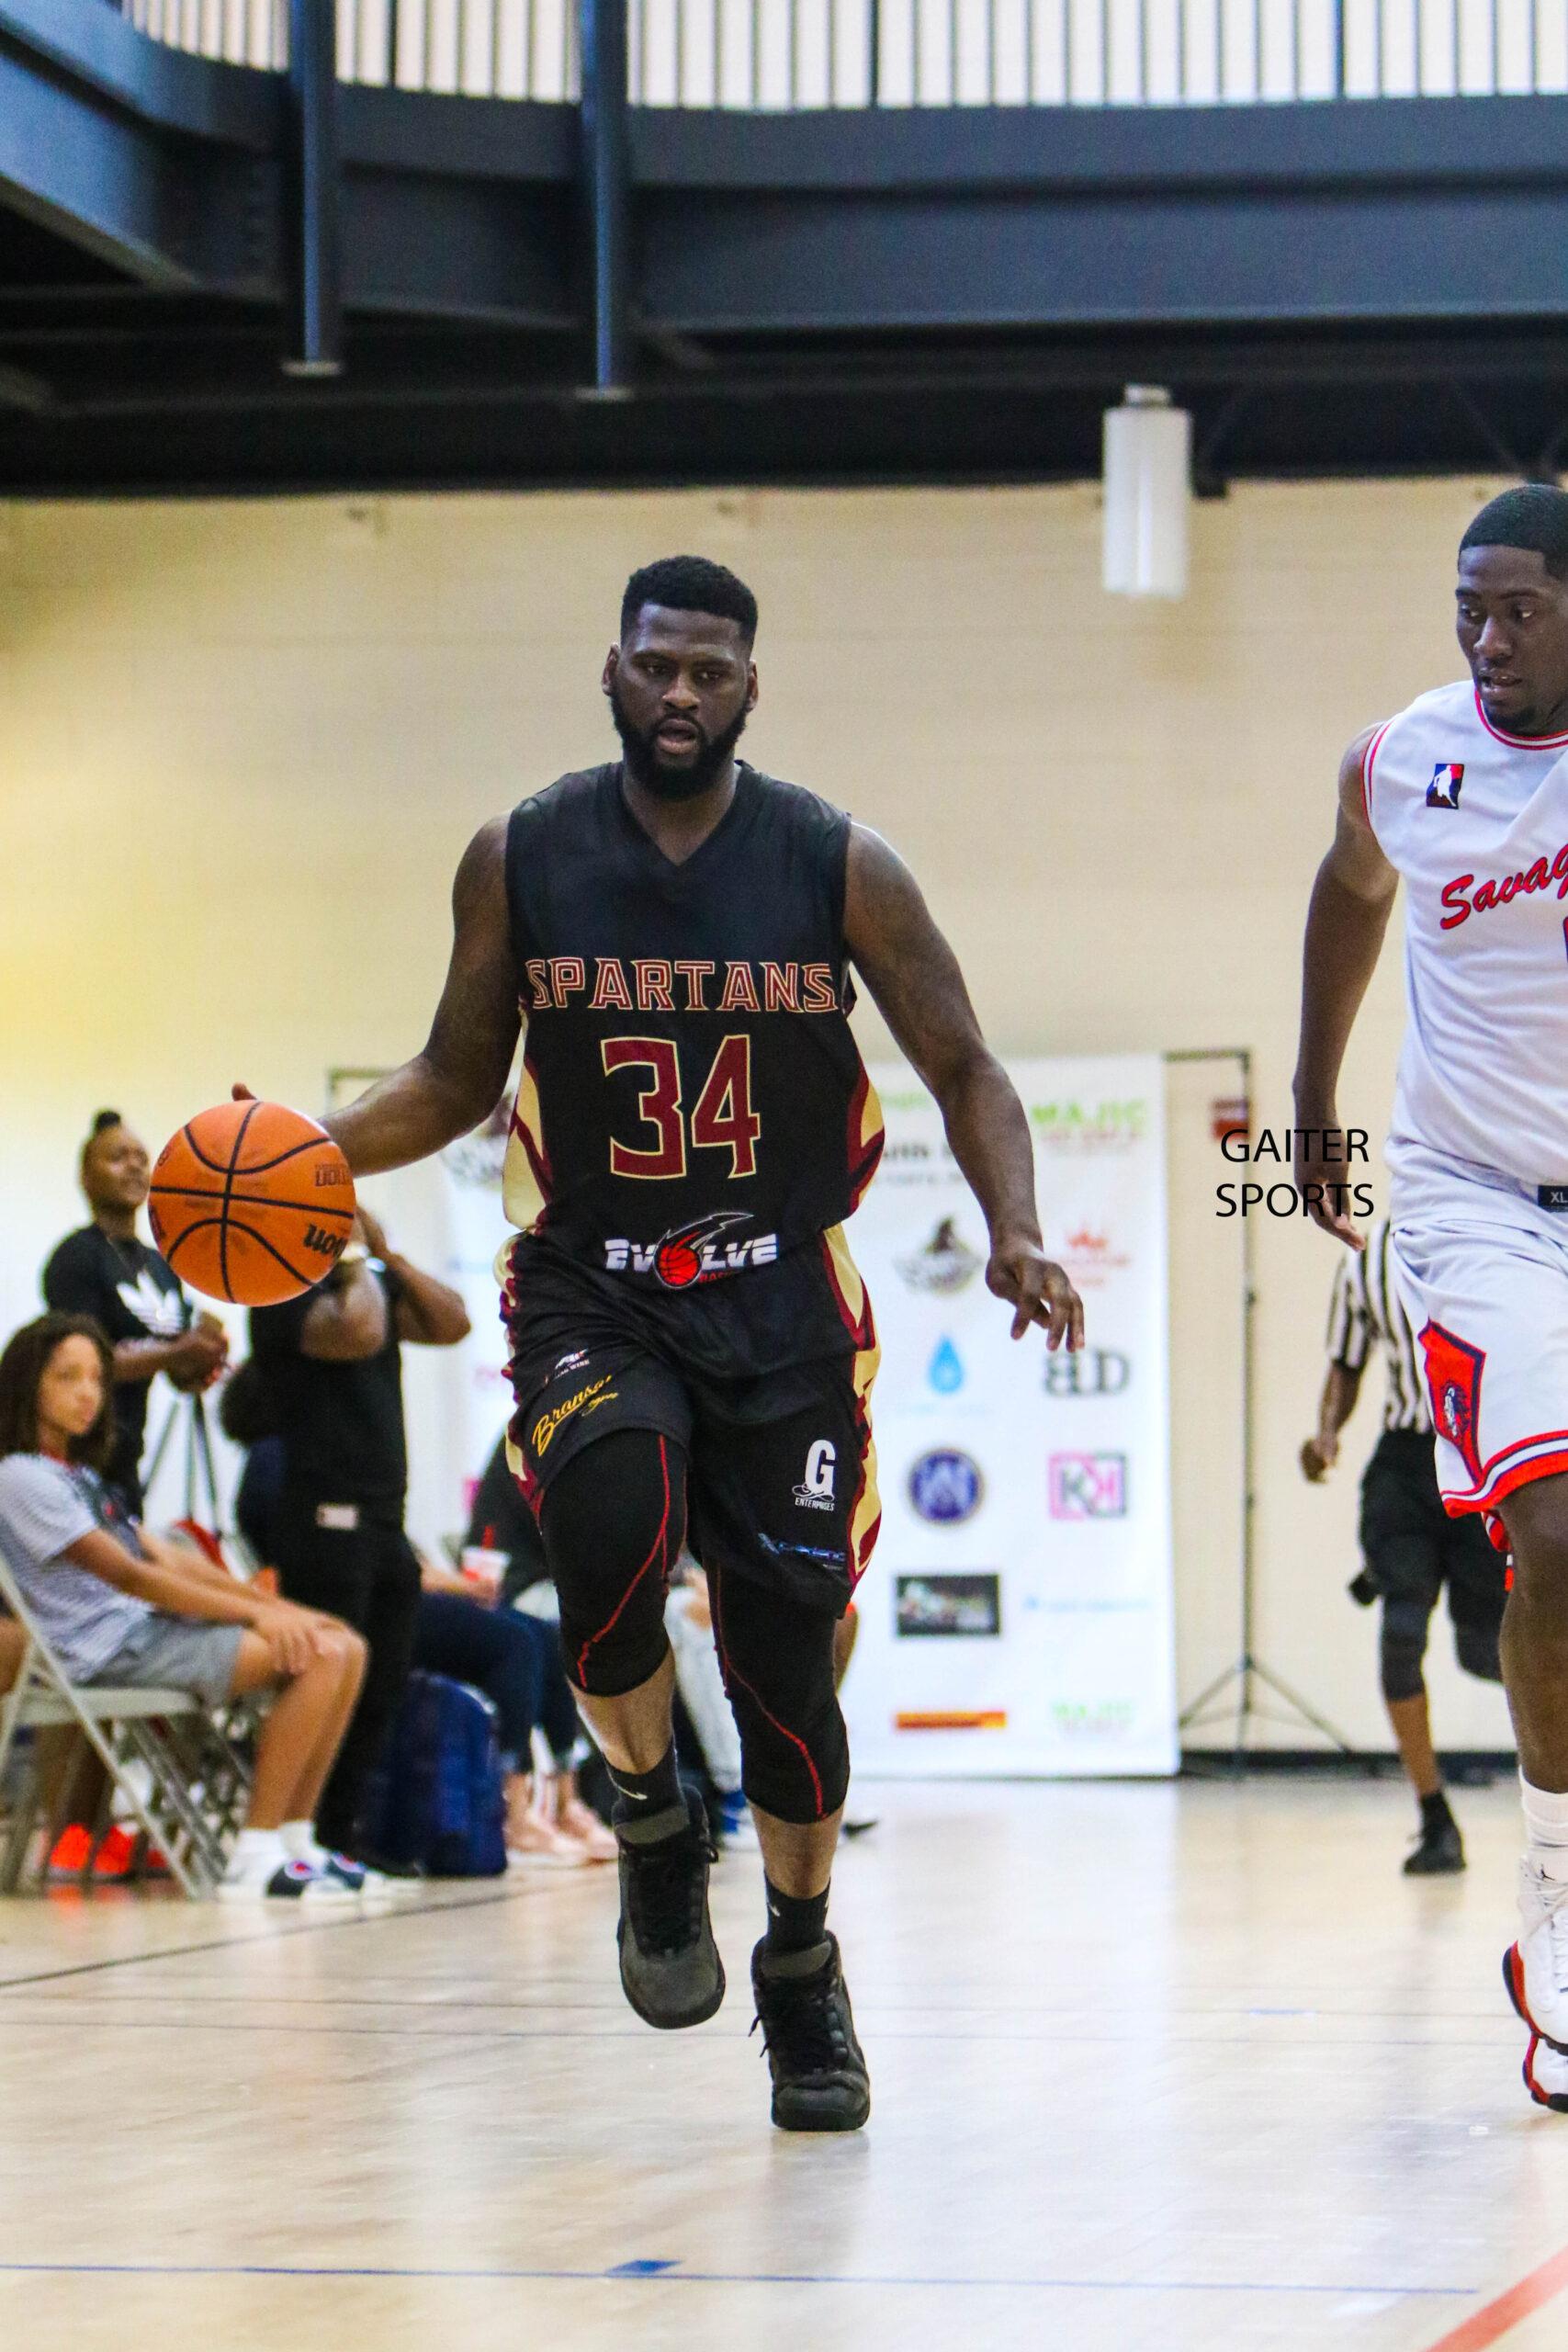 2019 Celebrity Basketball Game Georgia Spartans 113